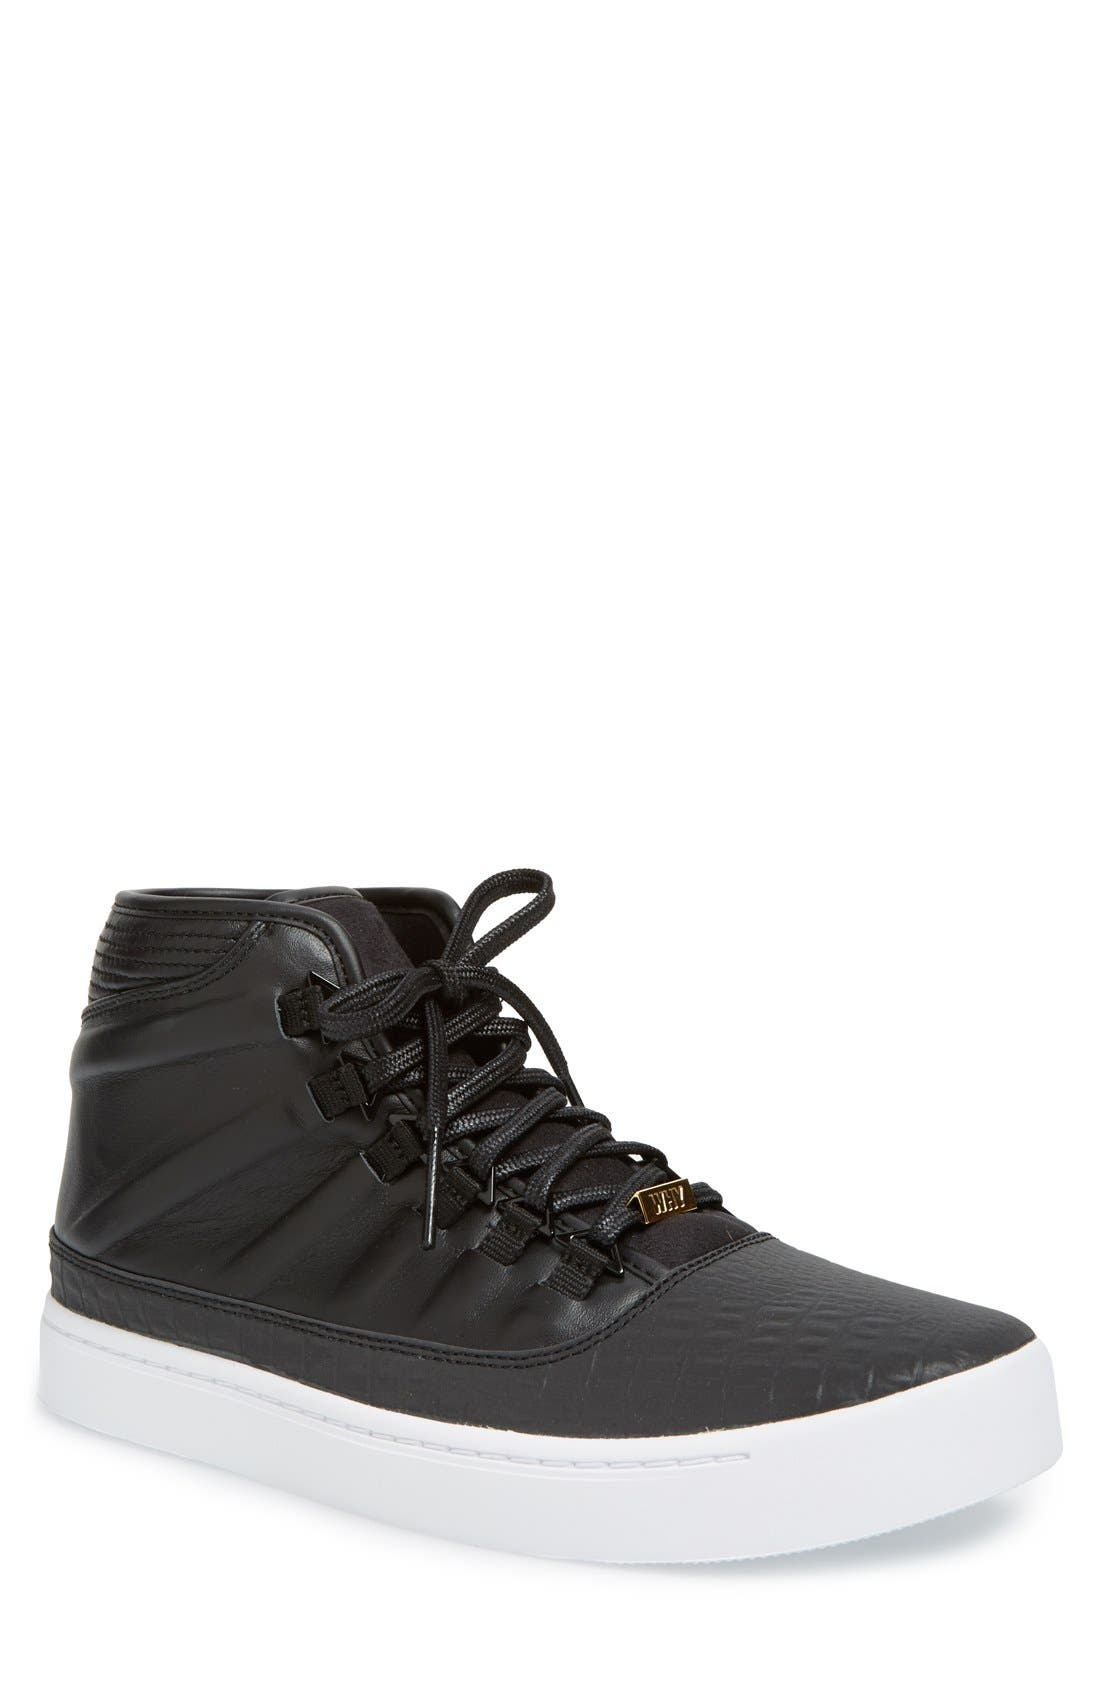 'Jordan - Westbrook 0' High Top Sneaker,                             Main thumbnail 1, color,                             001